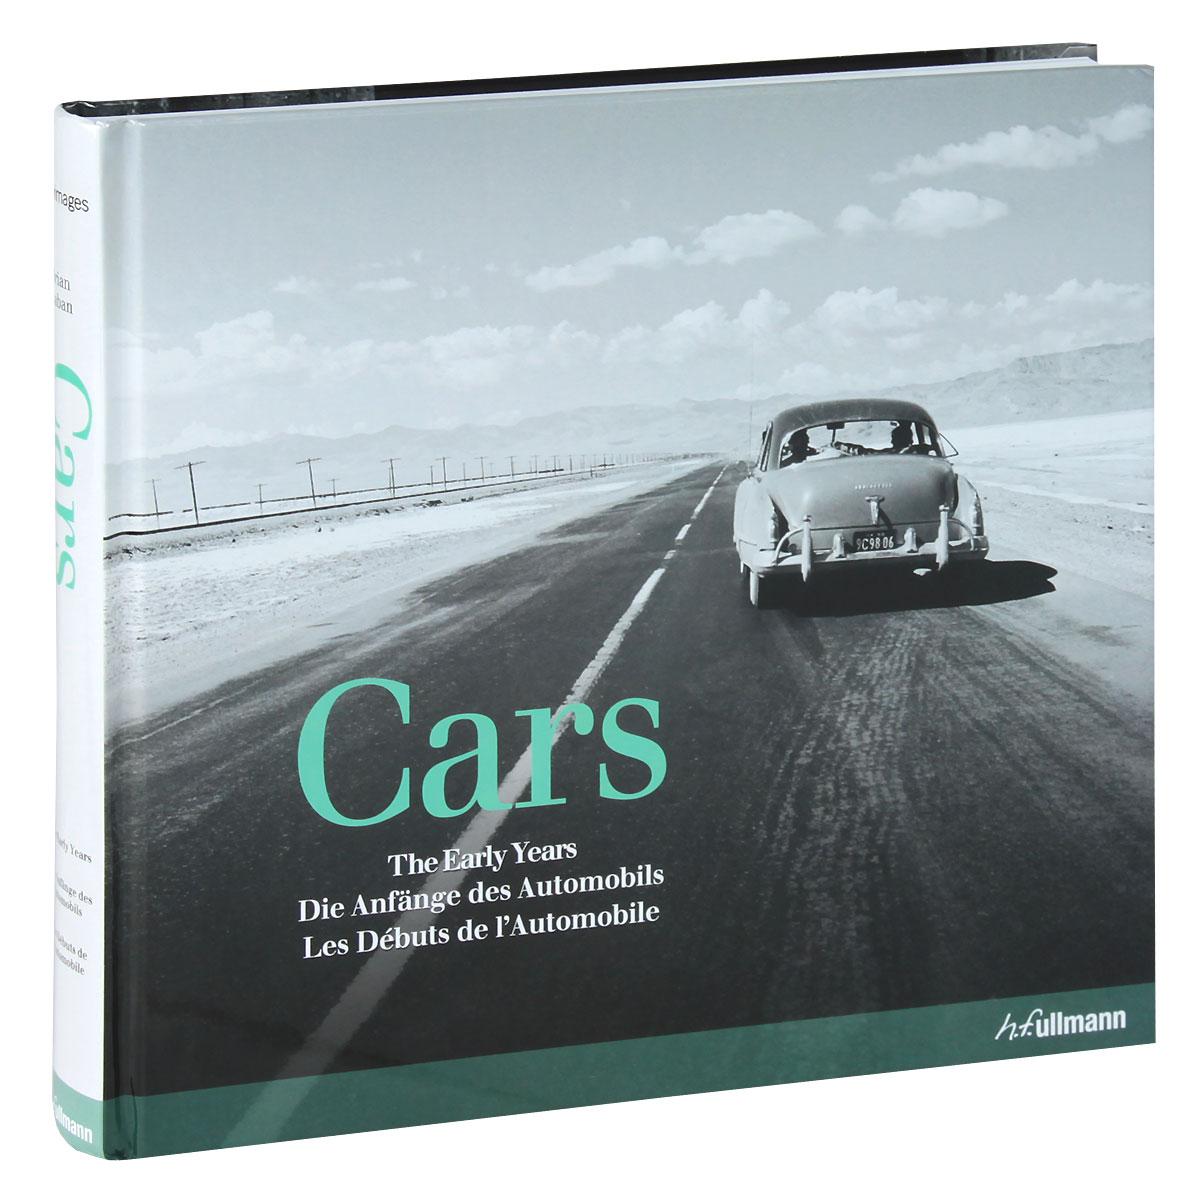 Cars: The Early Years / Die Anfange des Automobils / Les debuts de lAutomobile